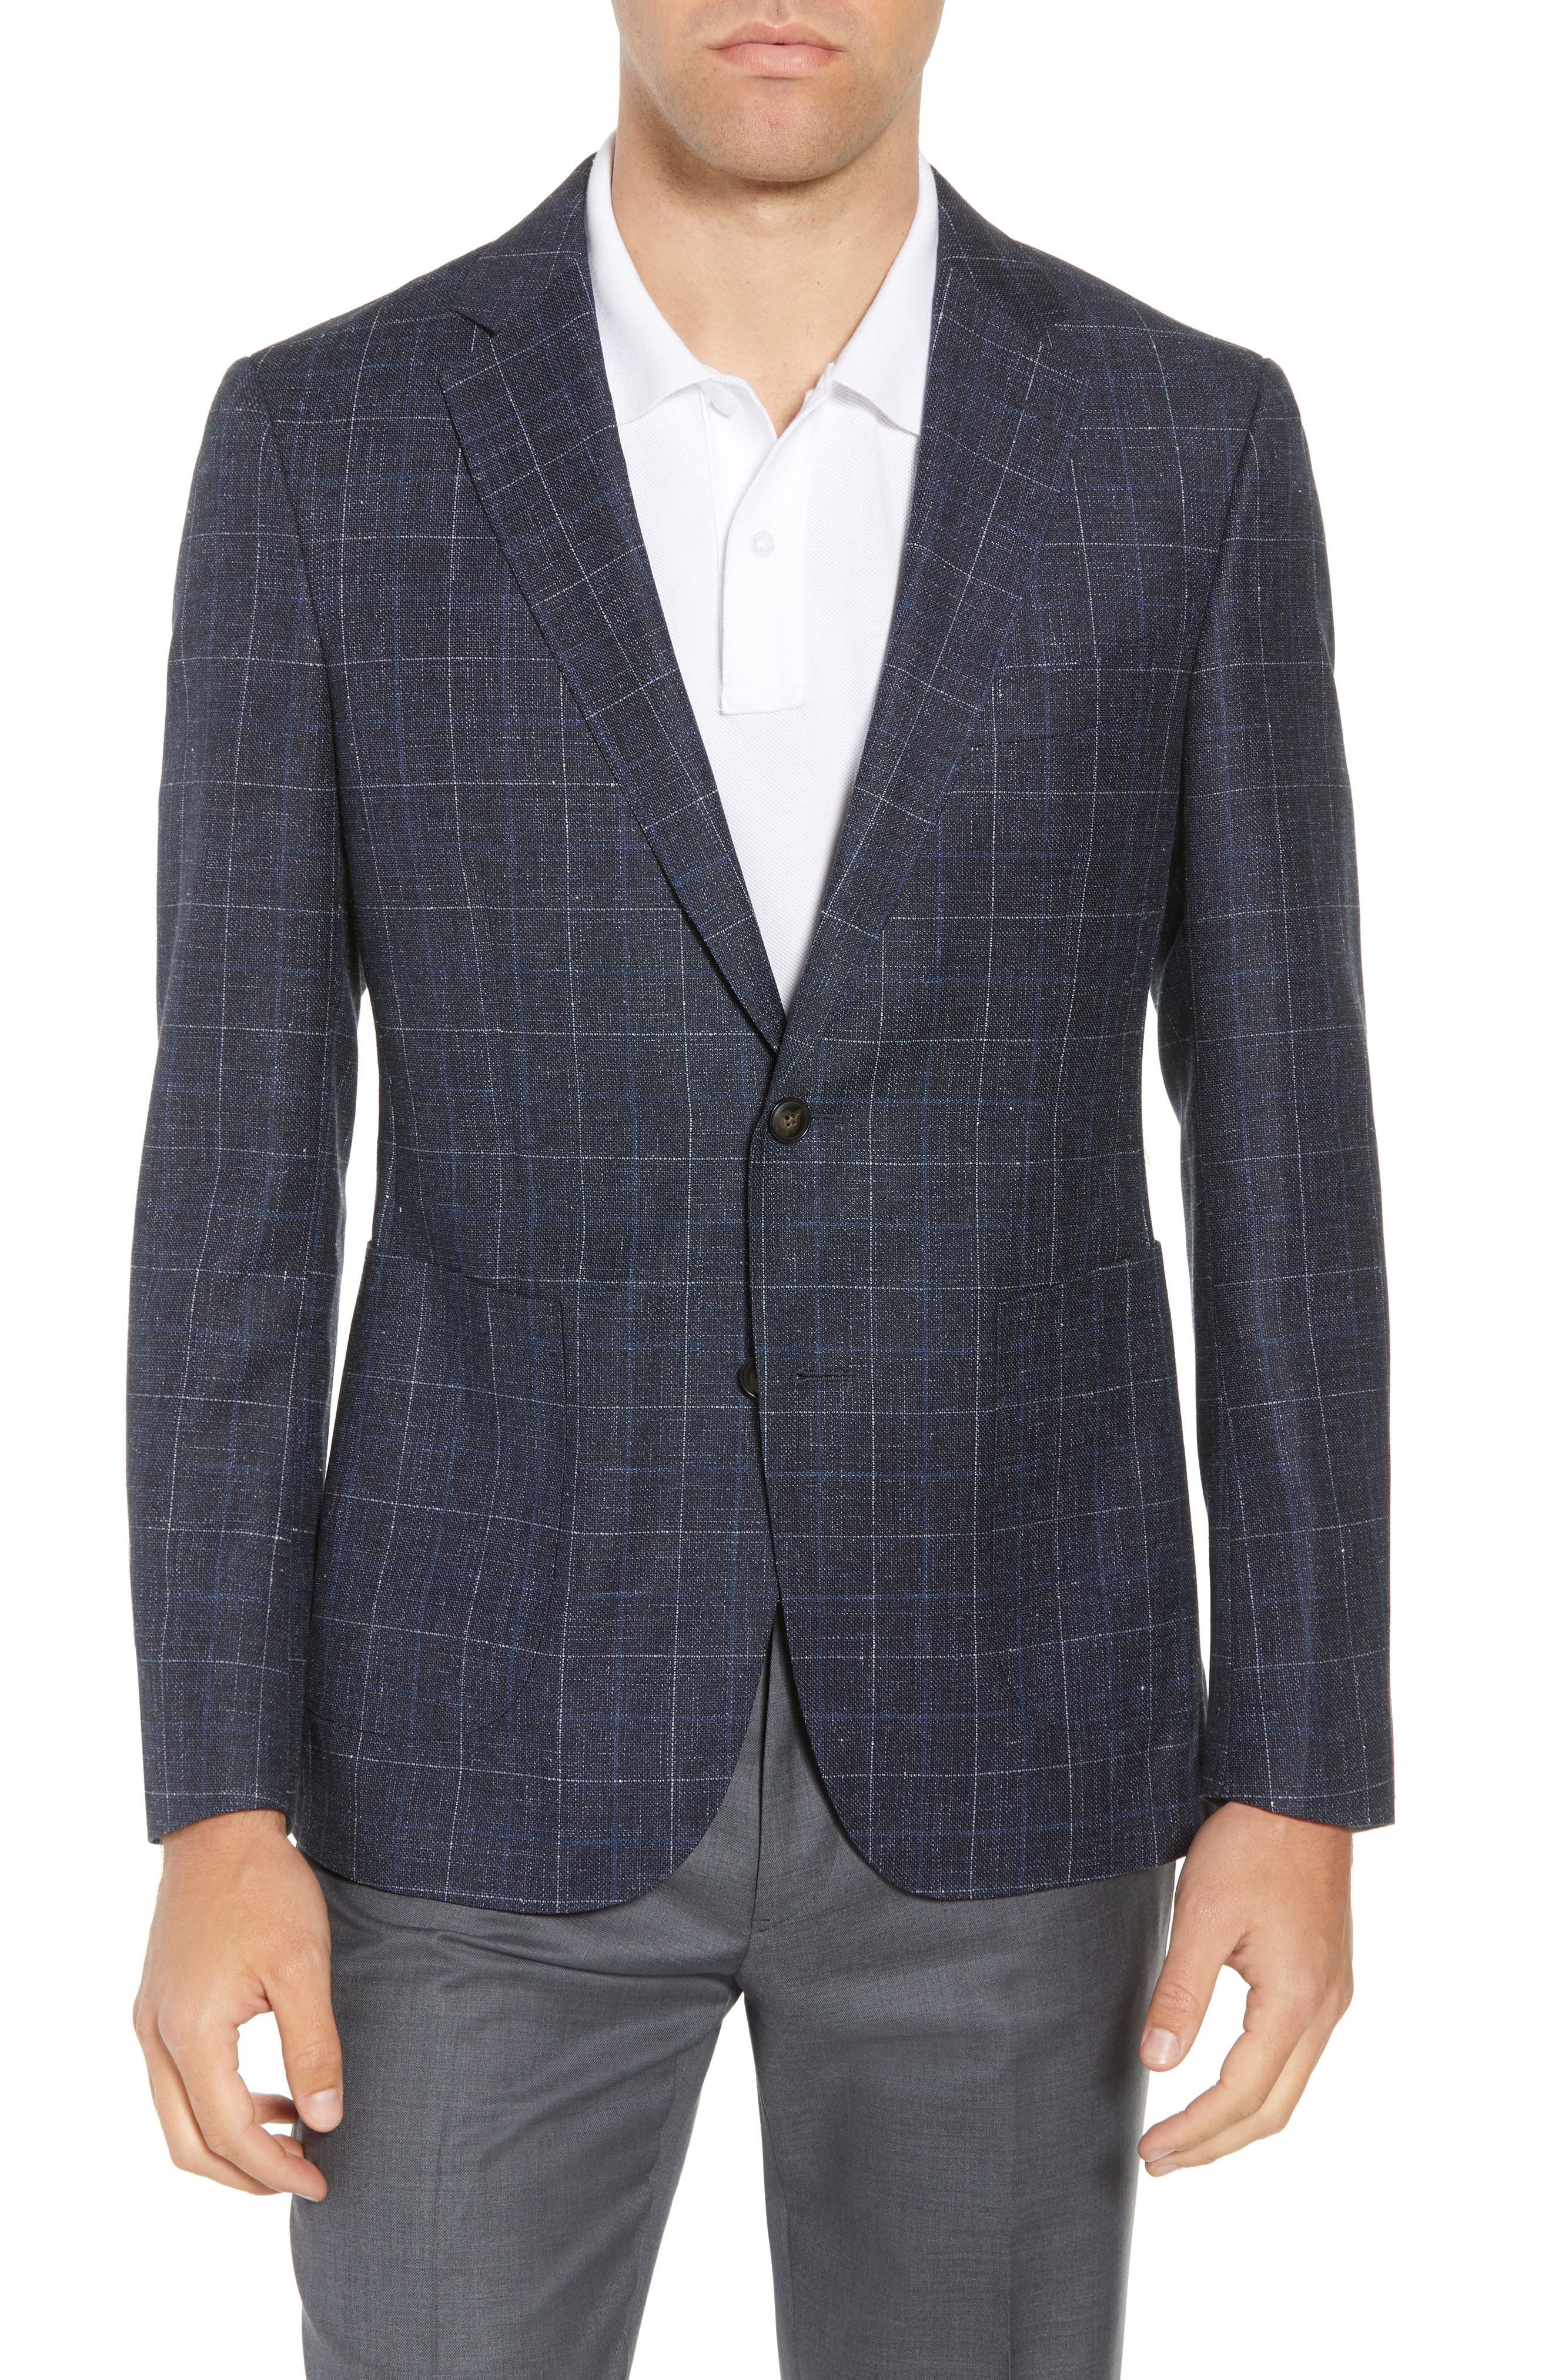 Discount Newest Rodd & Gunn Alfredton Place Linen Blazer Cheap Price Fake For Sale Free Shipping Buy snHMTvuaFa